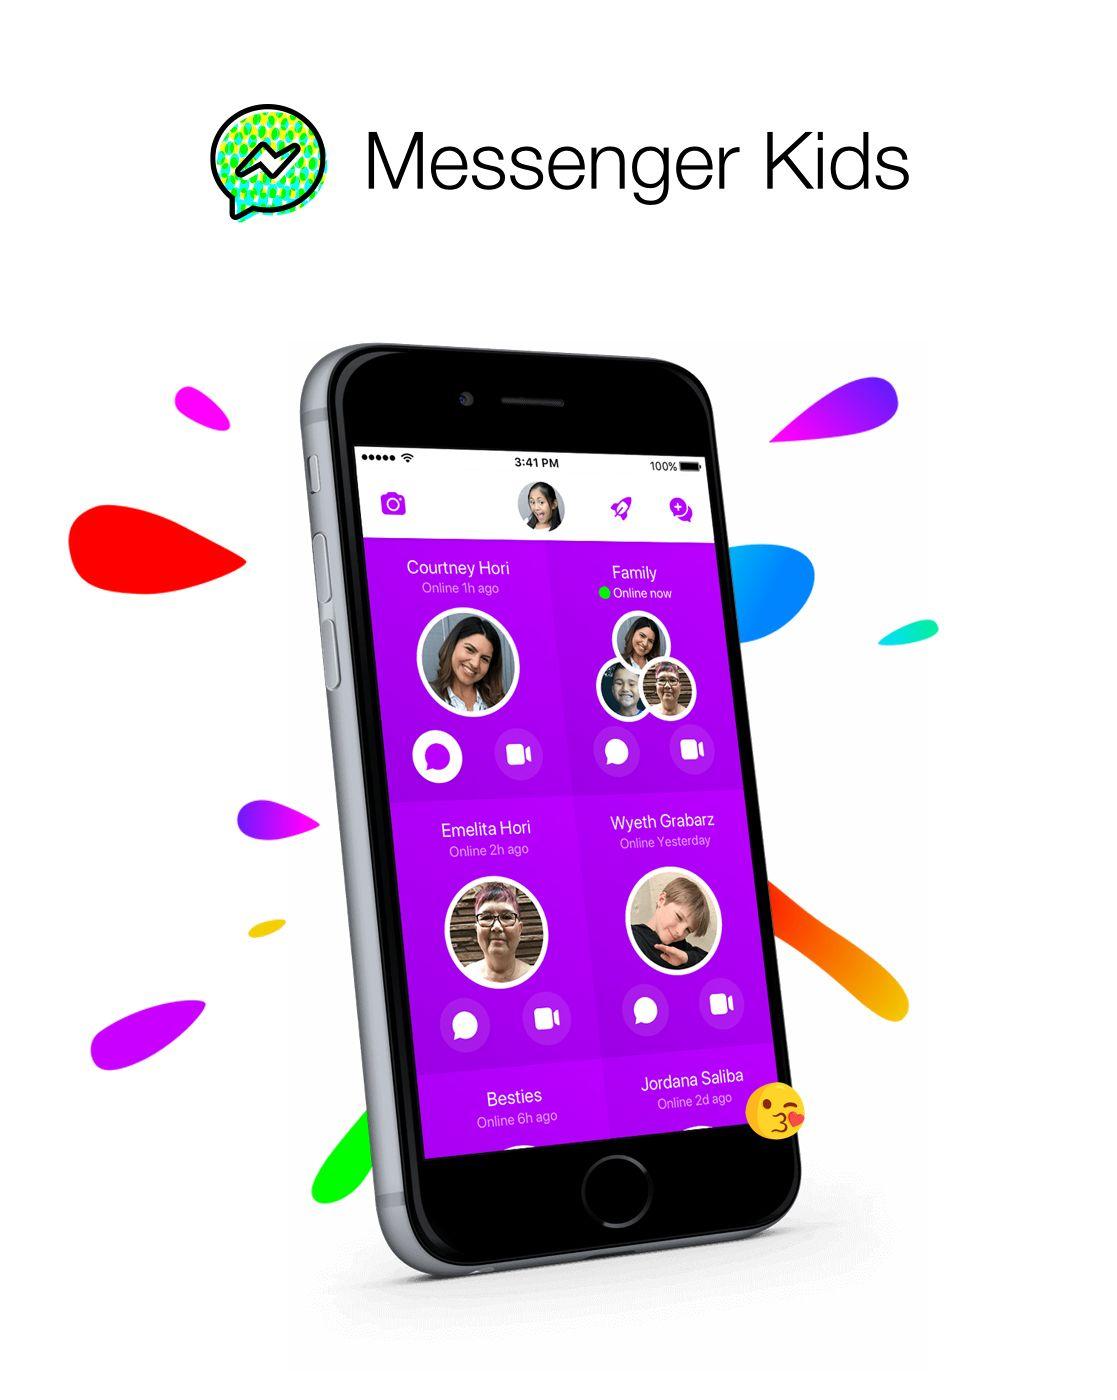 Facebook Messenger Kids The social media giant's parent